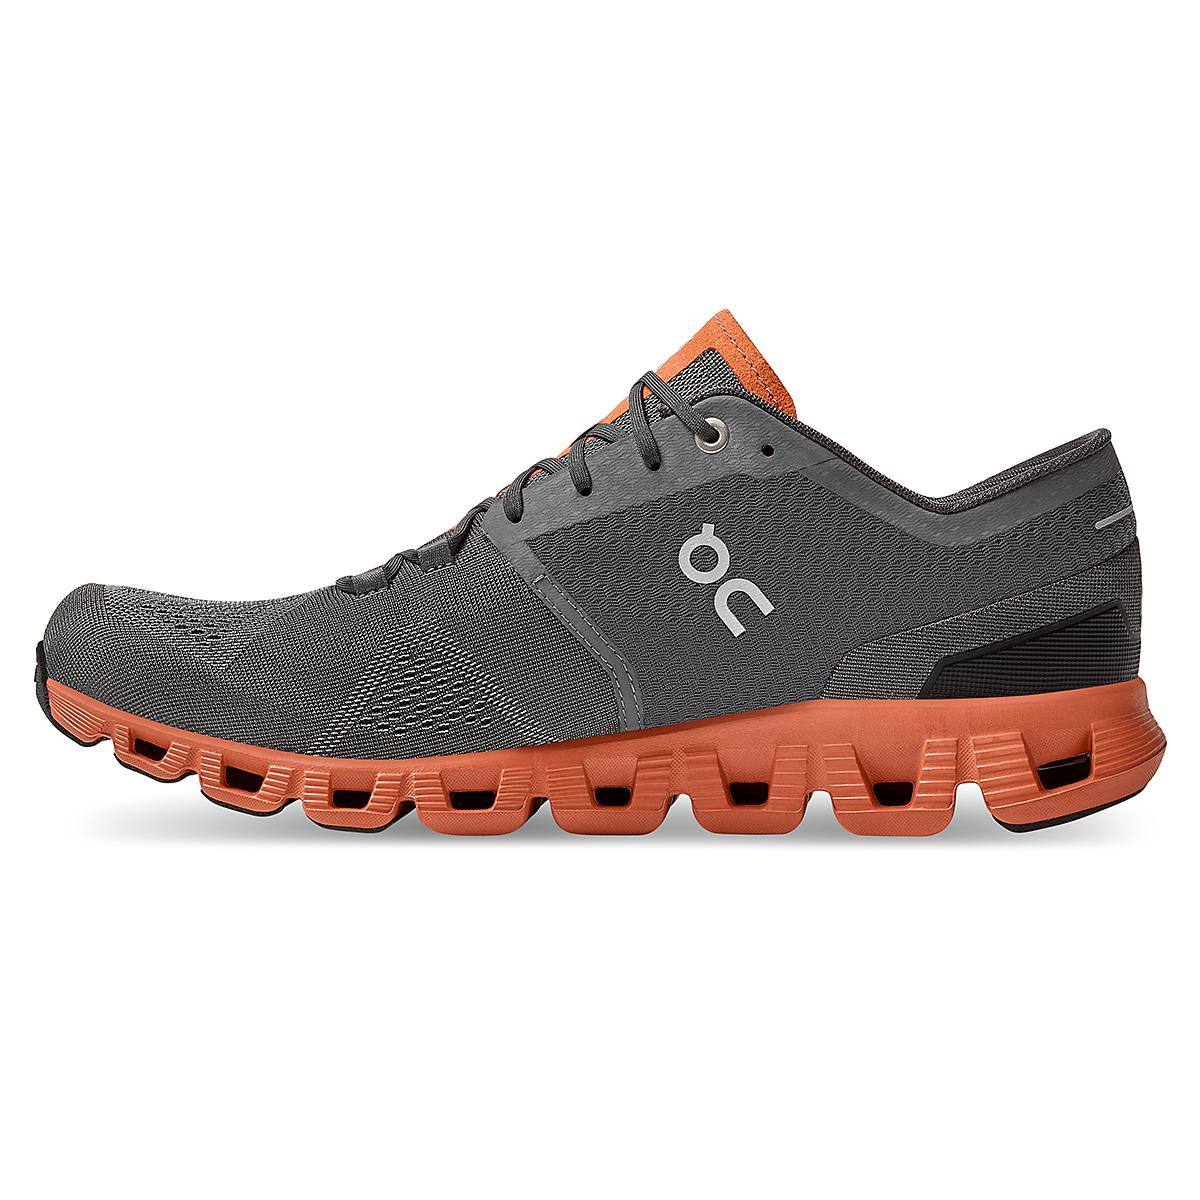 Men's On Cloud X 2.0 Training Shoe - Color: Rust/Rock - Size: 7 - Width: Regular, Rust/Rock, large, image 3